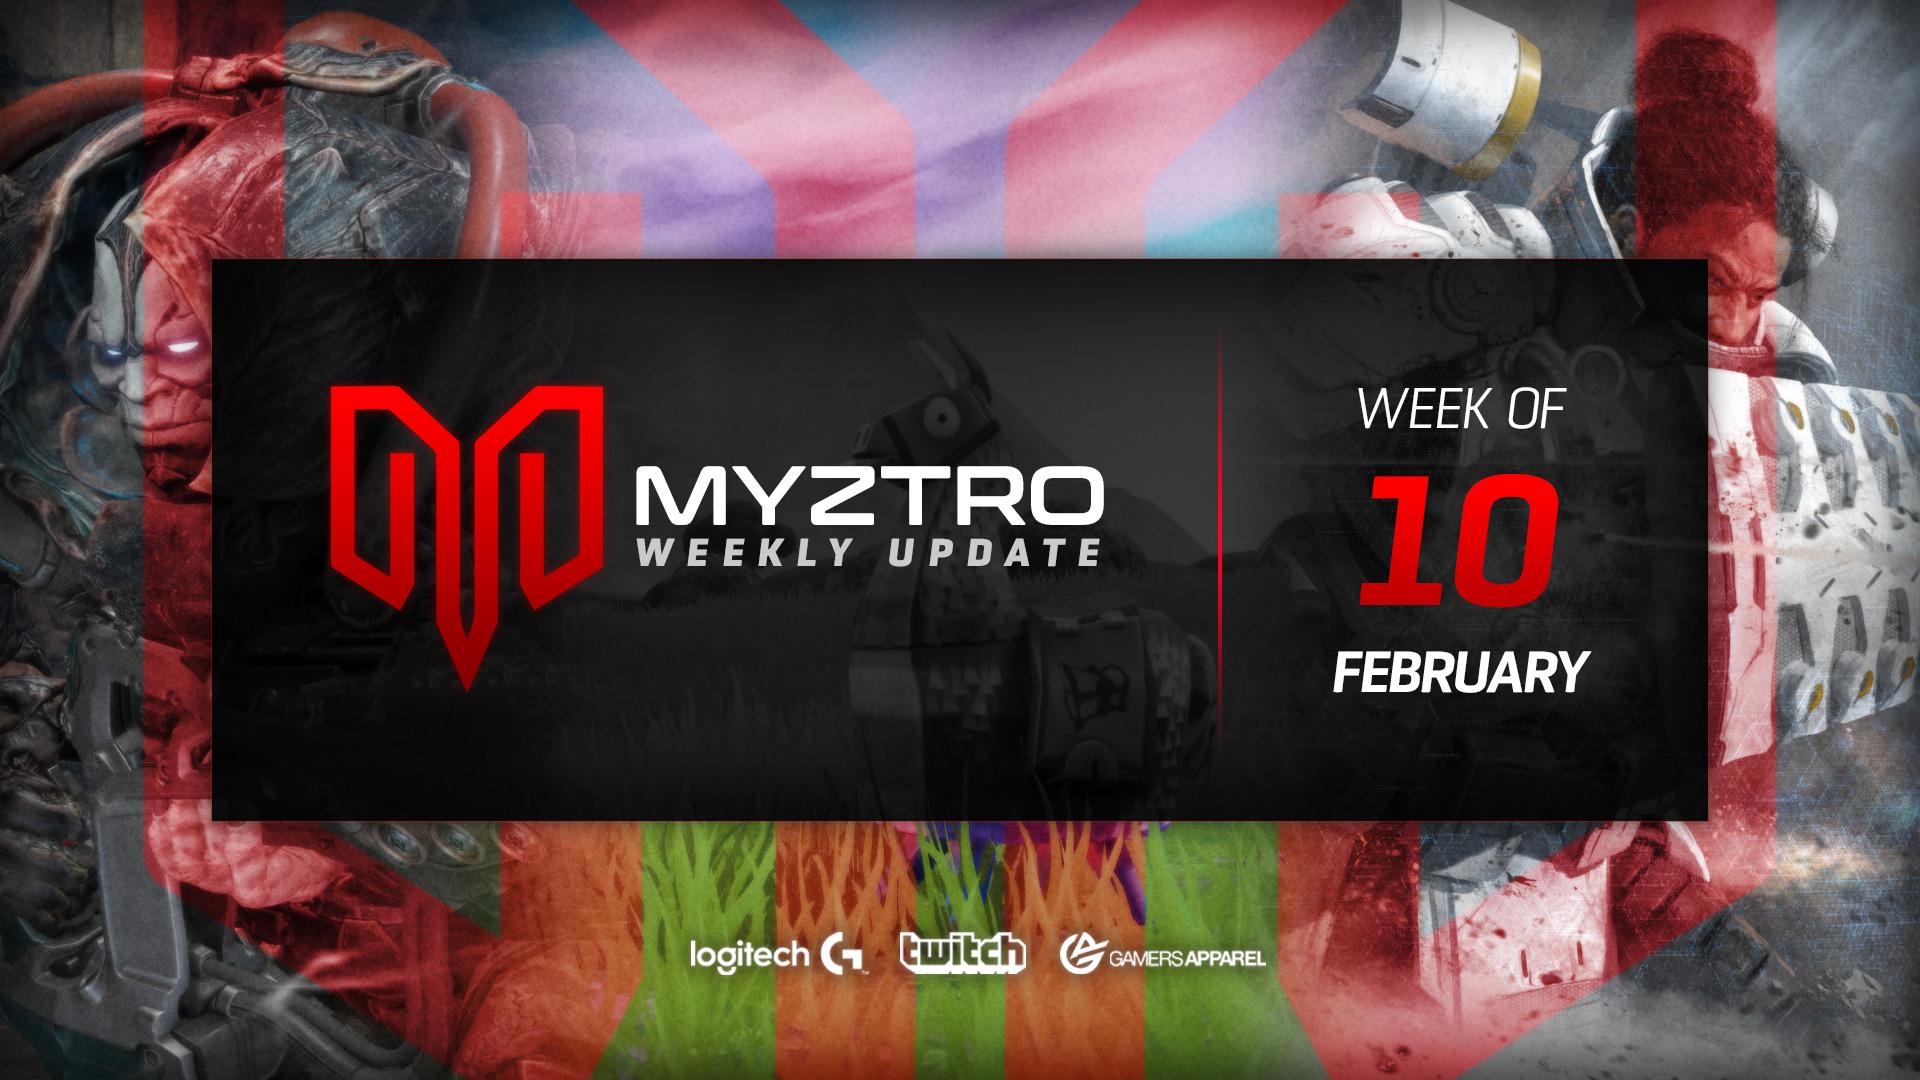 Myztro Weekly Update 11: 2/12/20